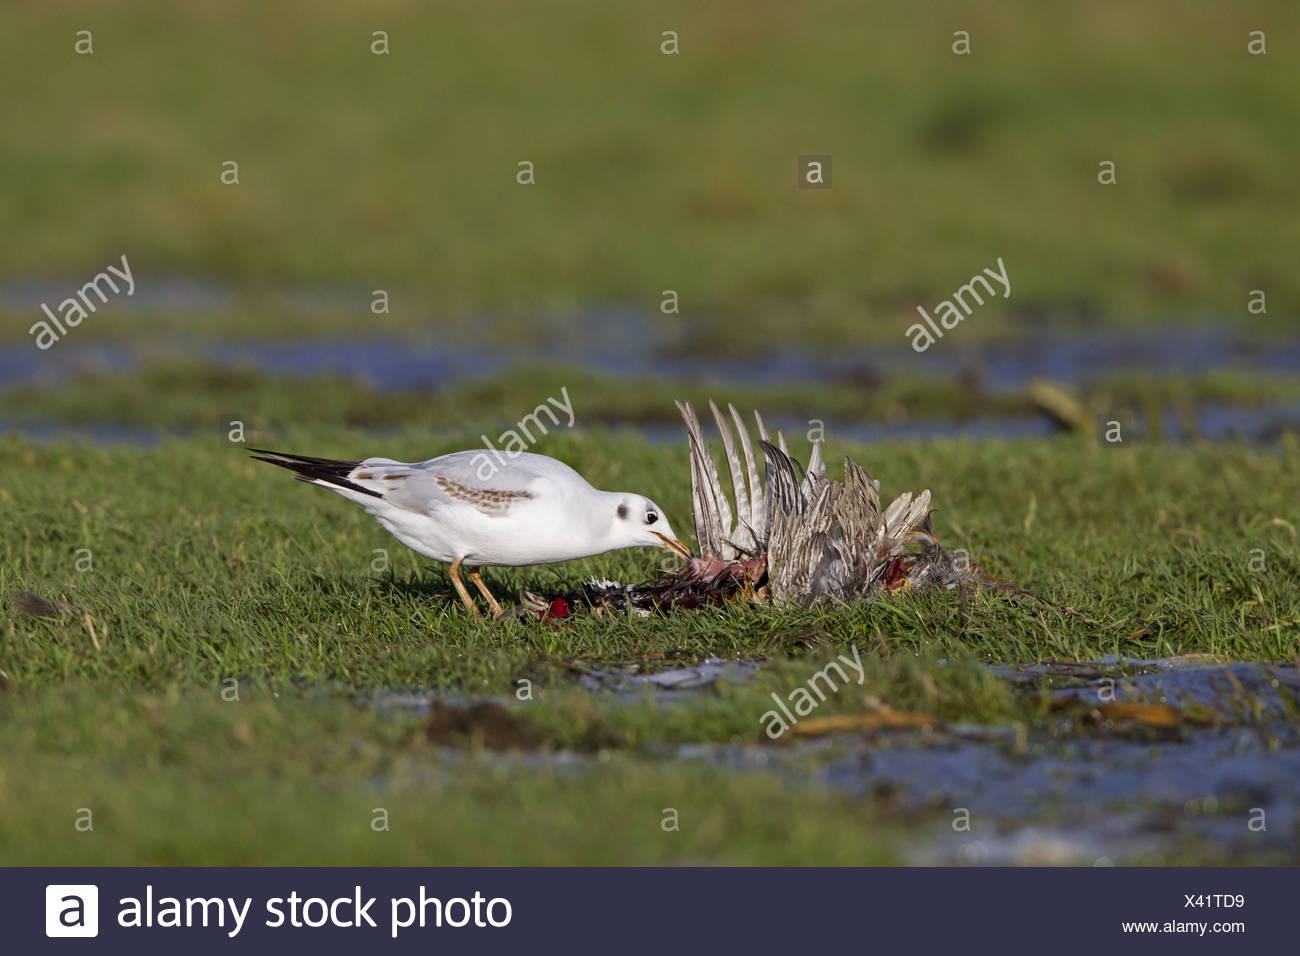 Black-headed Gull Larus ridibundus immature first winter plumage feeding on dead Common Pheasant Phasianus colchicus adult male - Stock Image